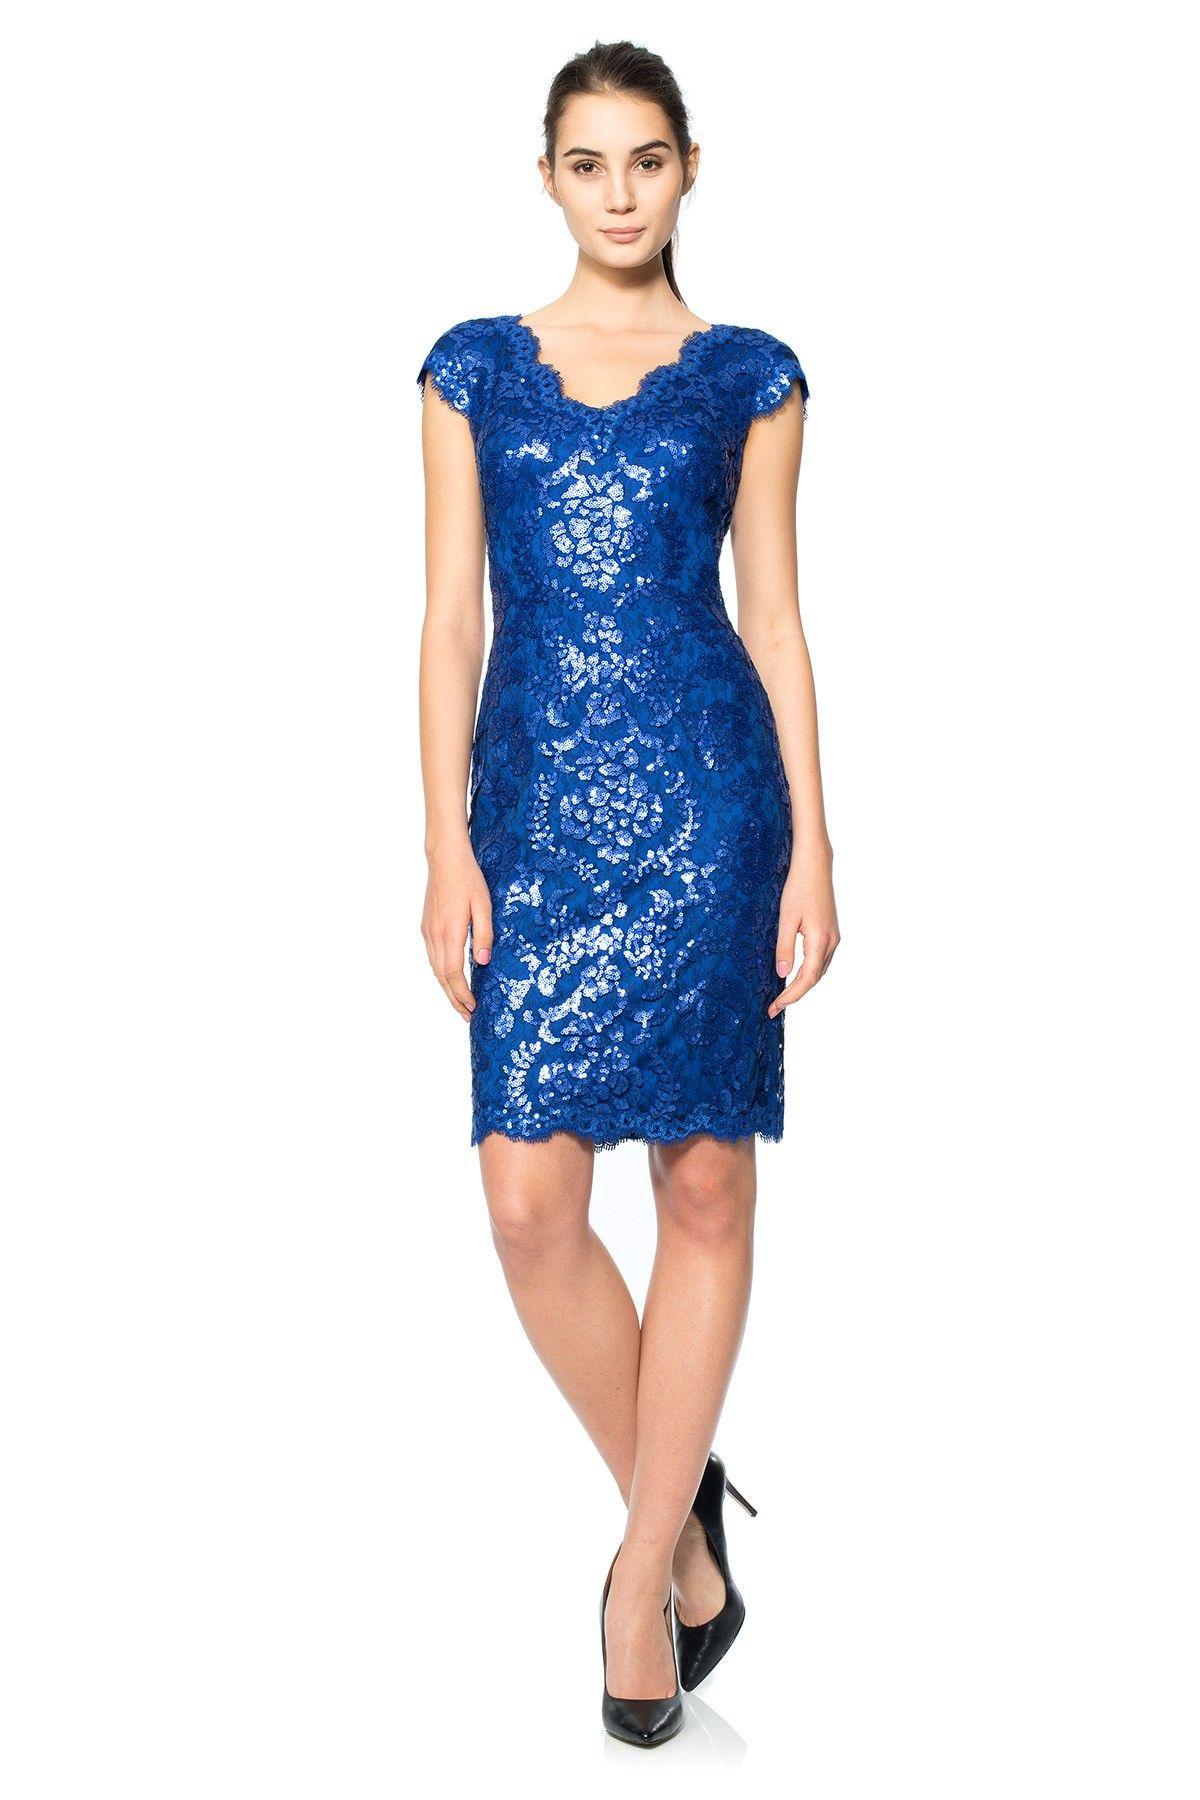 Paillette Embroidered Lace V-Neck Cap Sleeve Dress | Tadashi Shoji ...